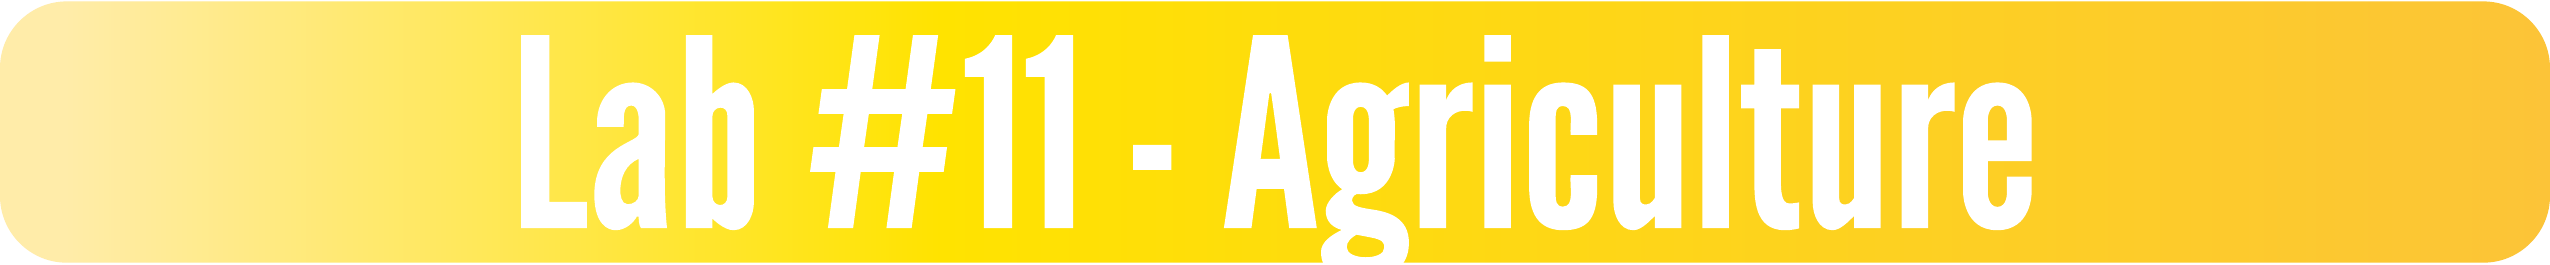 Lab #11 - Agriculture